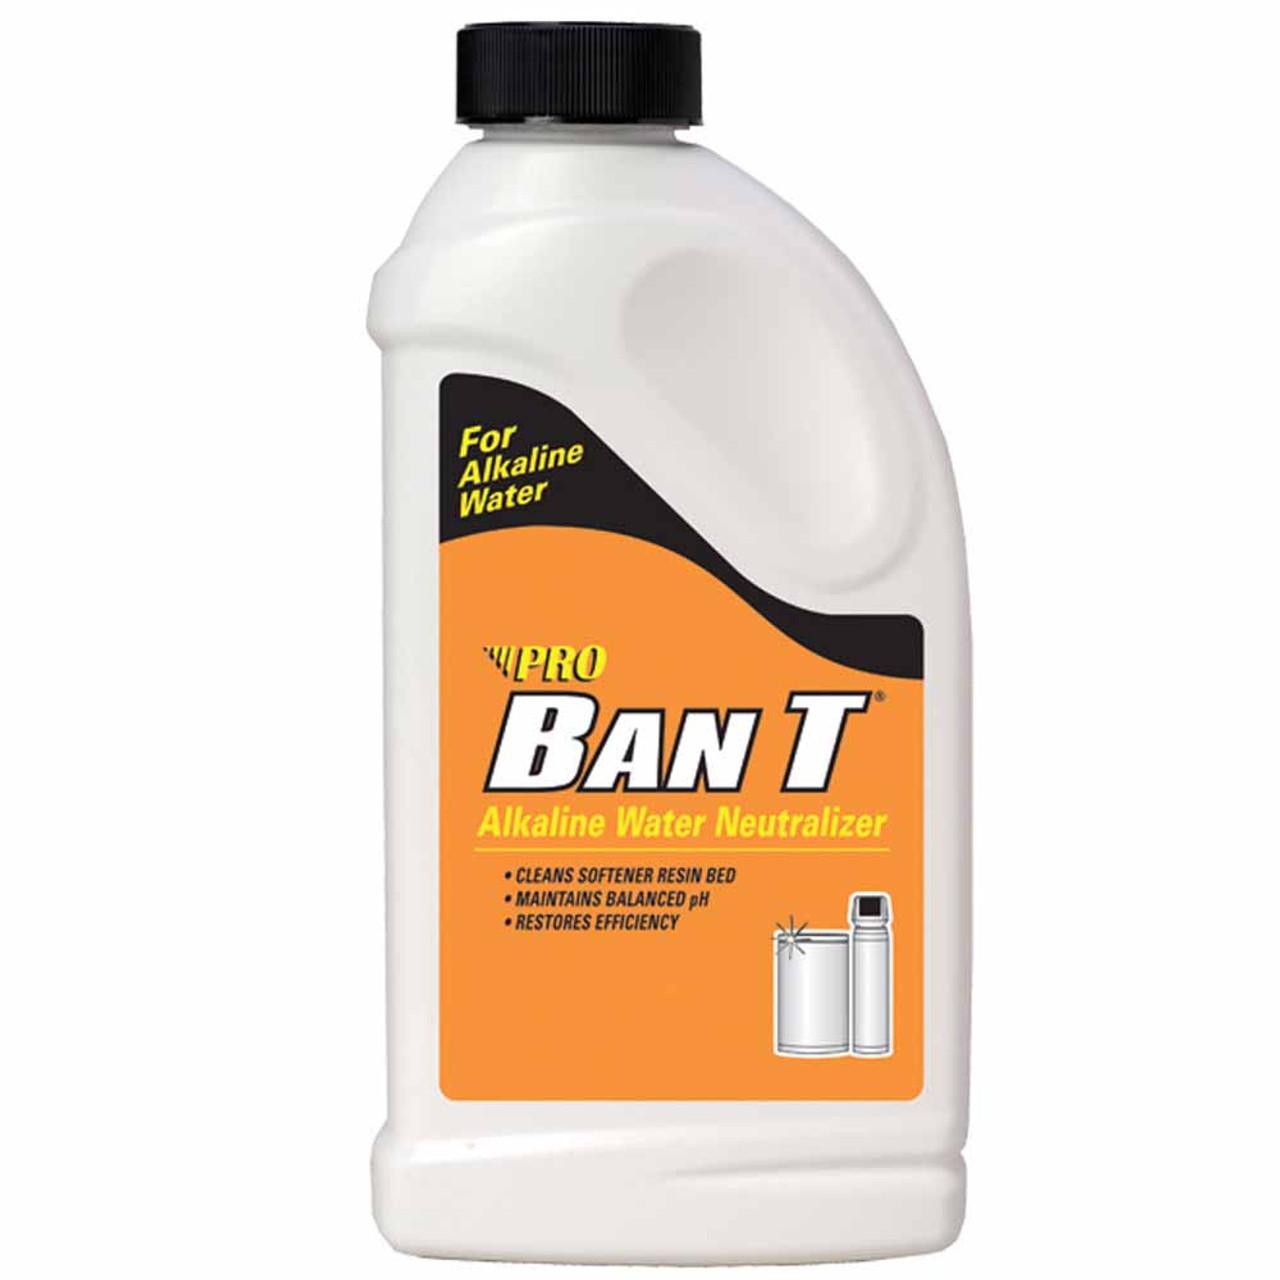 Artistic Citric Acid Water Softener Vs Salt Citric Acid Water Softener Iron Pro Ban T Citric Acid Case Pro Ban T Citric Acid Case houzz-02 Citric Acid Water Softener